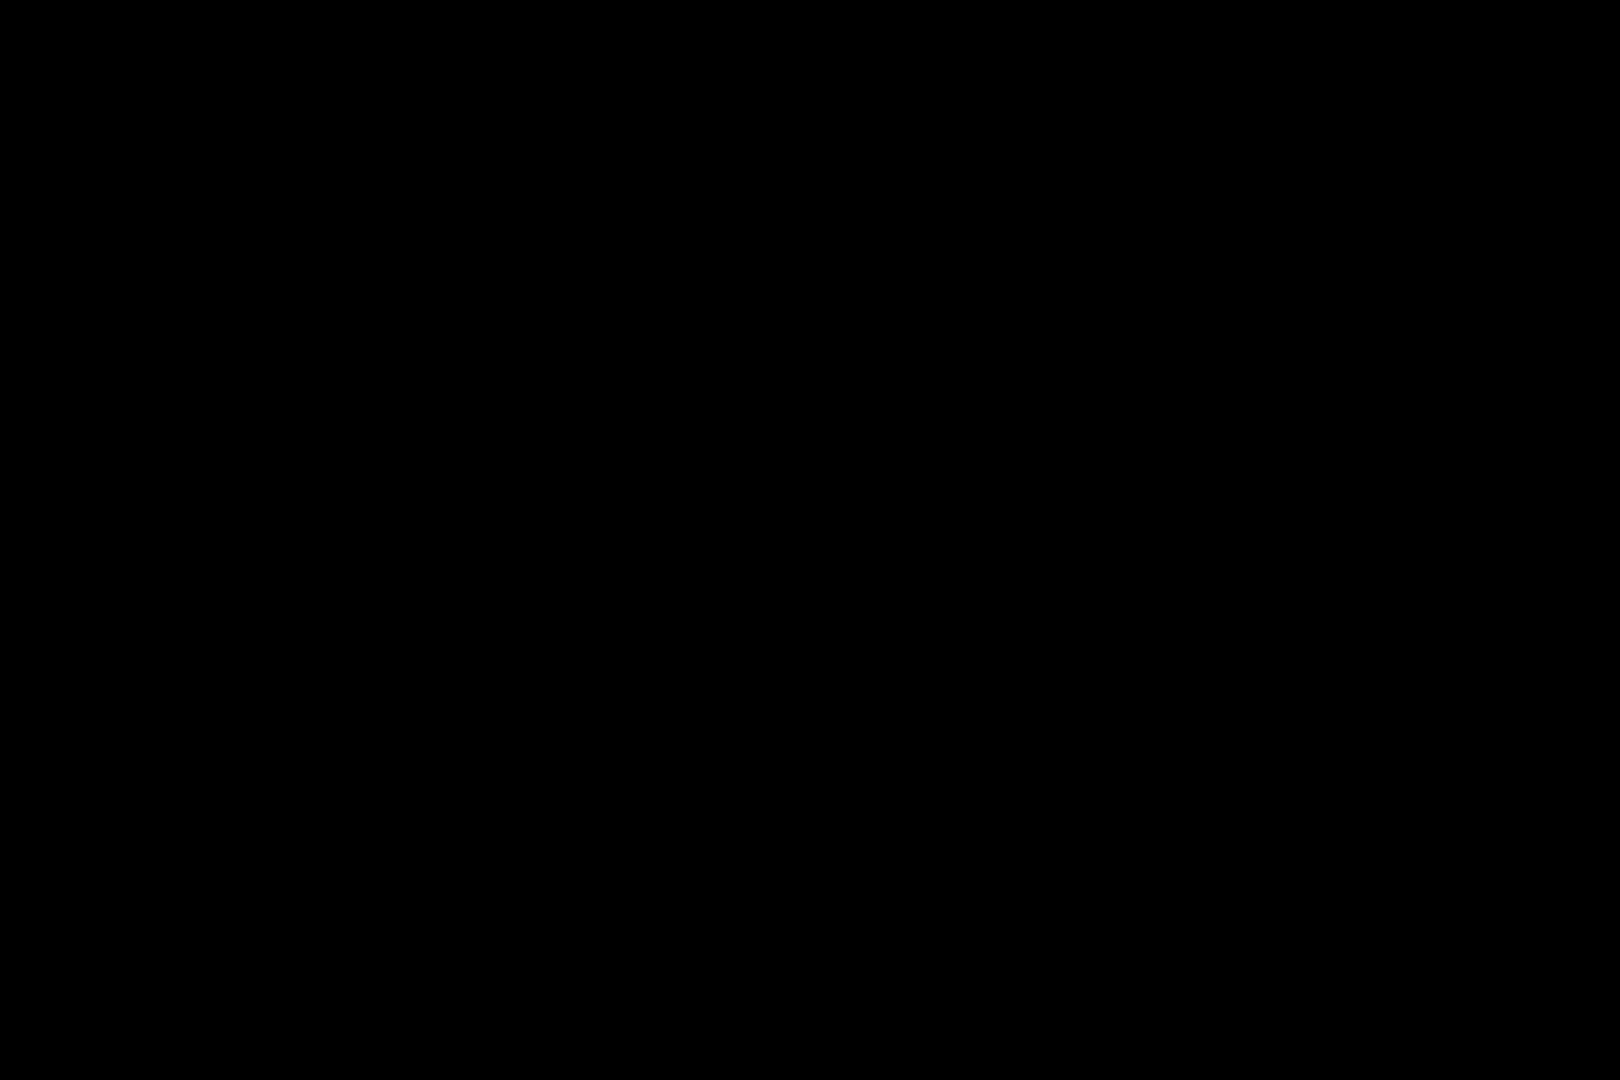 H大好き熟女と自宅でハメ撮り~中原まりこ~ むっちり | オナニー  110連発 15